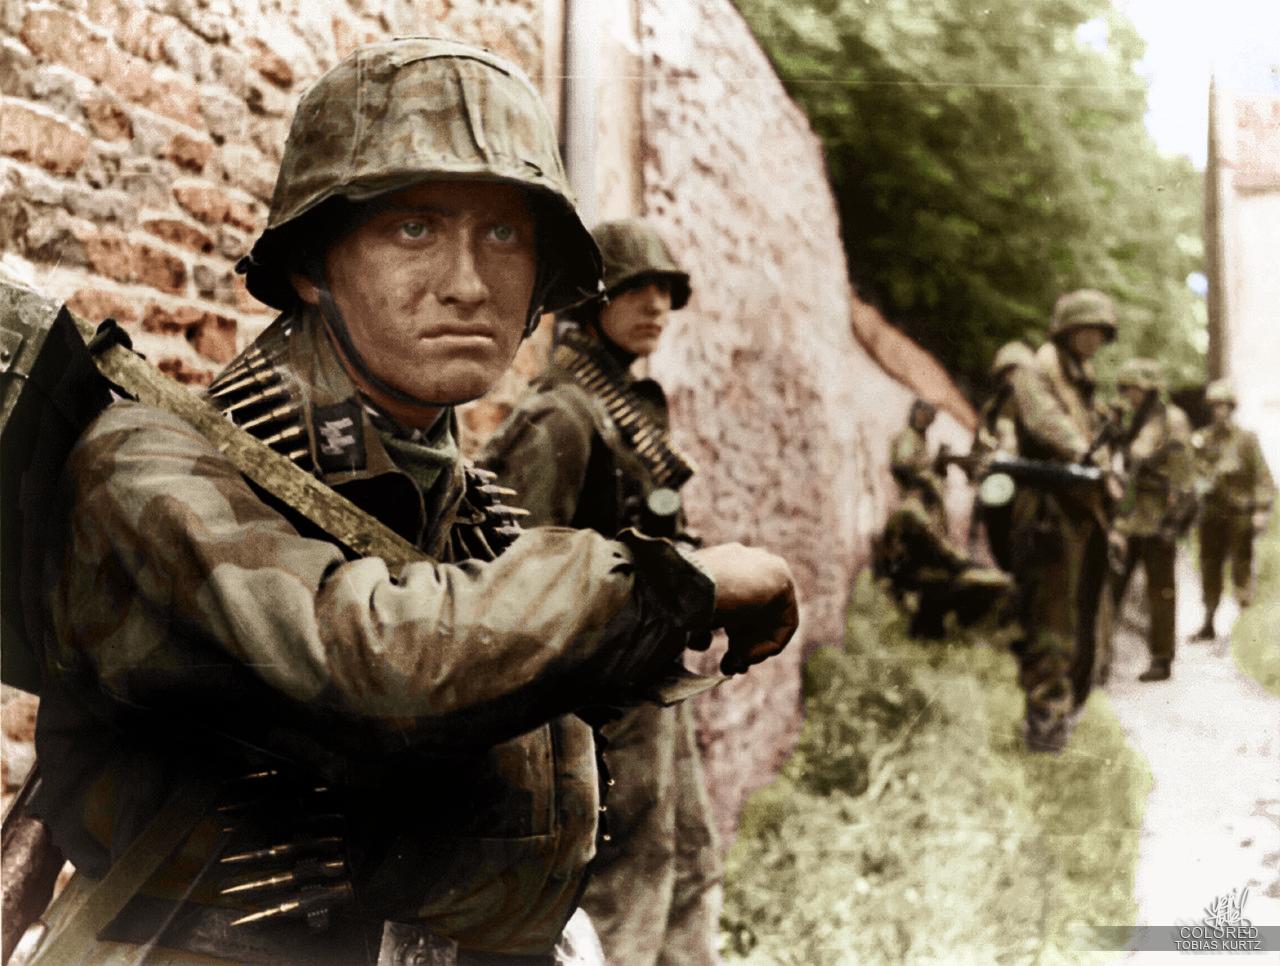 WW2 in Color [- BETA -] by kapo-neu on DeviantArt